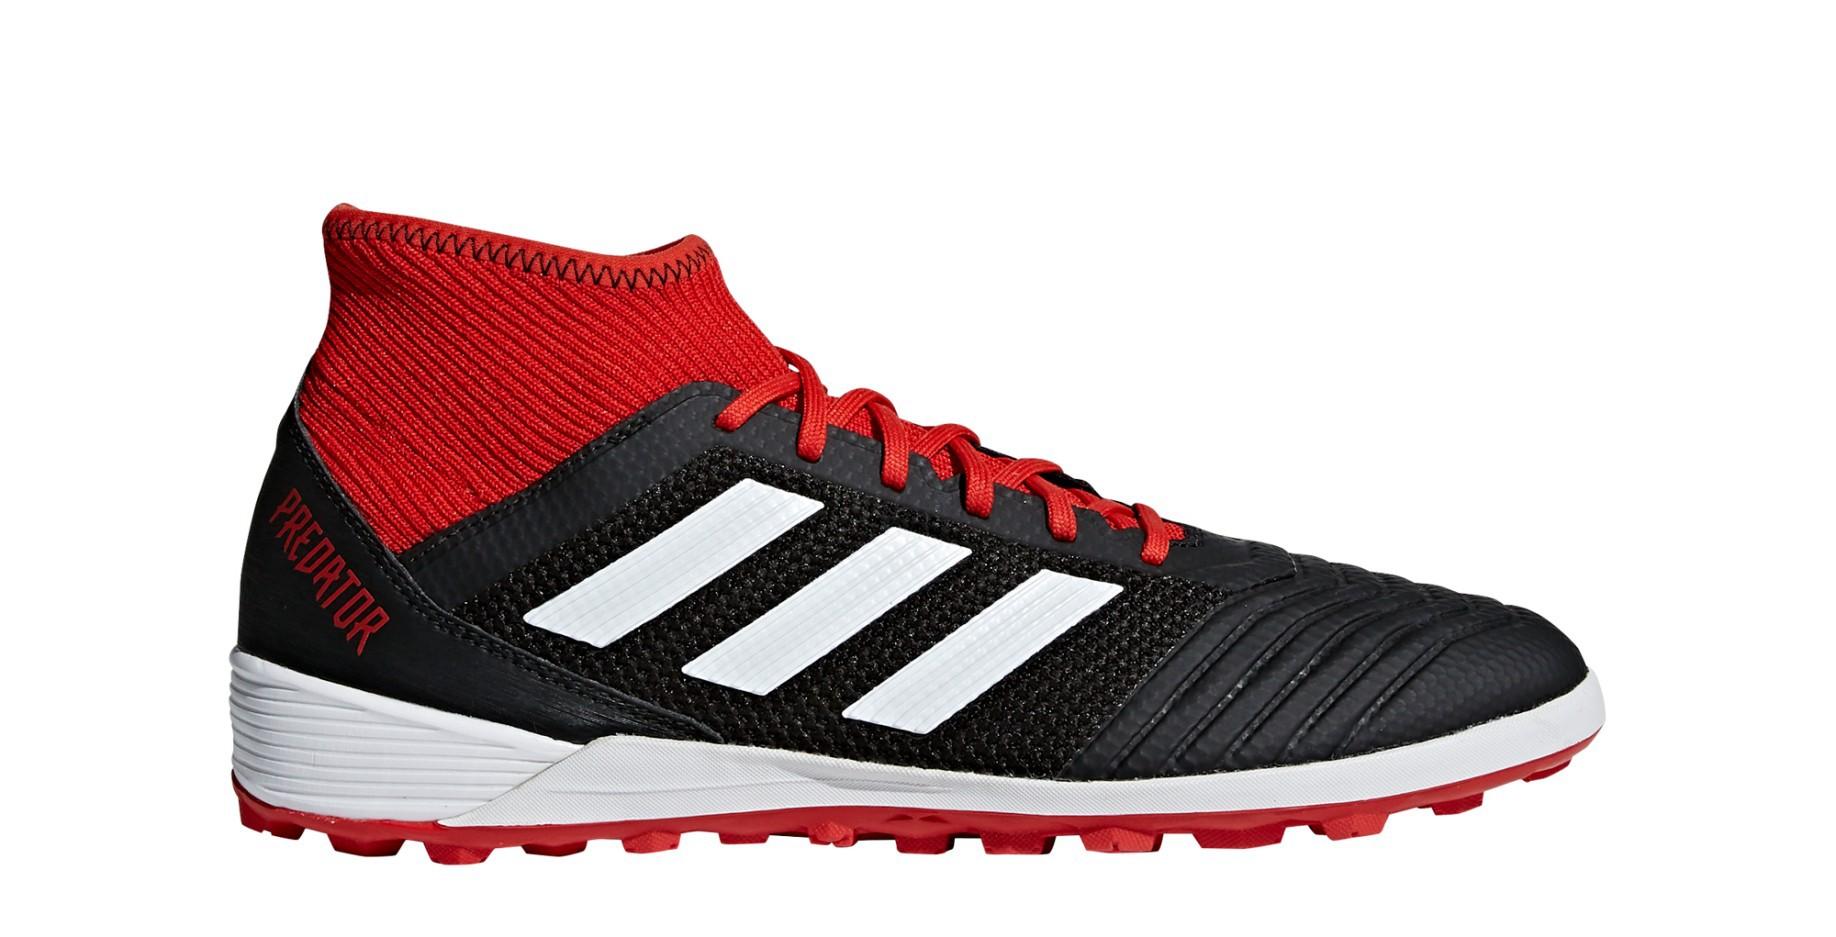 Calcetto Predator Team Scarpe Adidas Pack Tango Mode 18 Tf Colore 3 PaU6Hqw